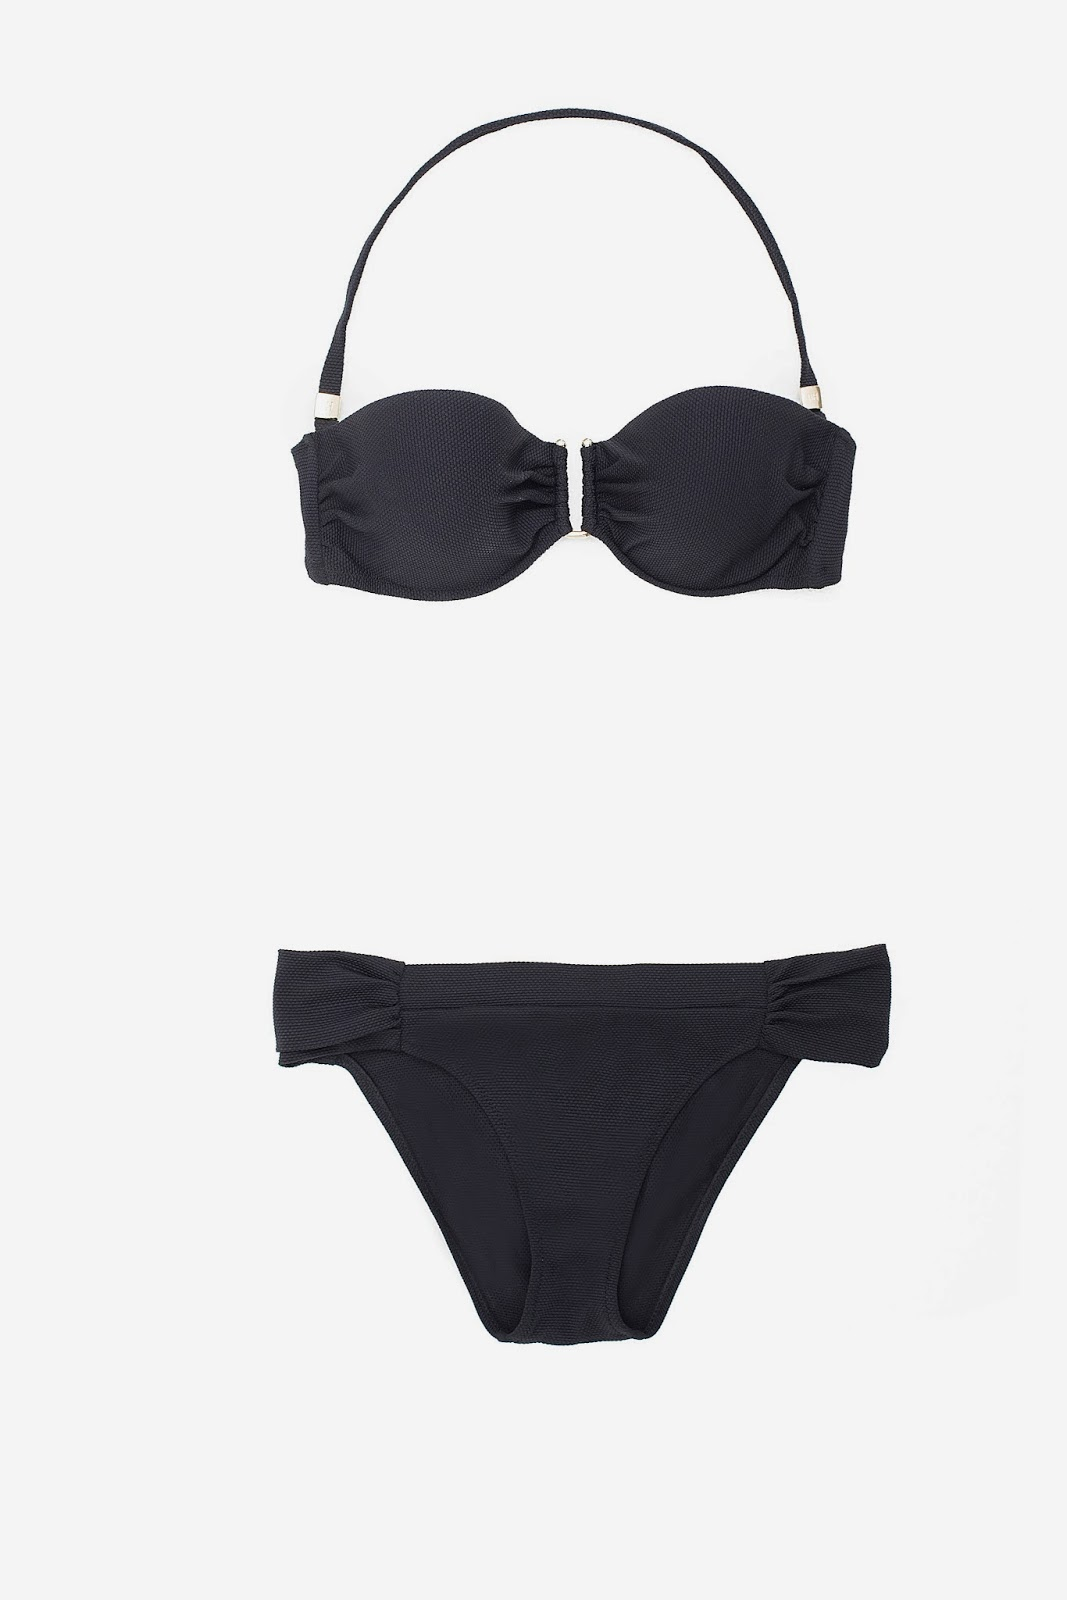 Pedro del Hierro Baño, bikini, bañador, summer, beach, moda baño, style, fashion blogger, fashion style, blog de moda